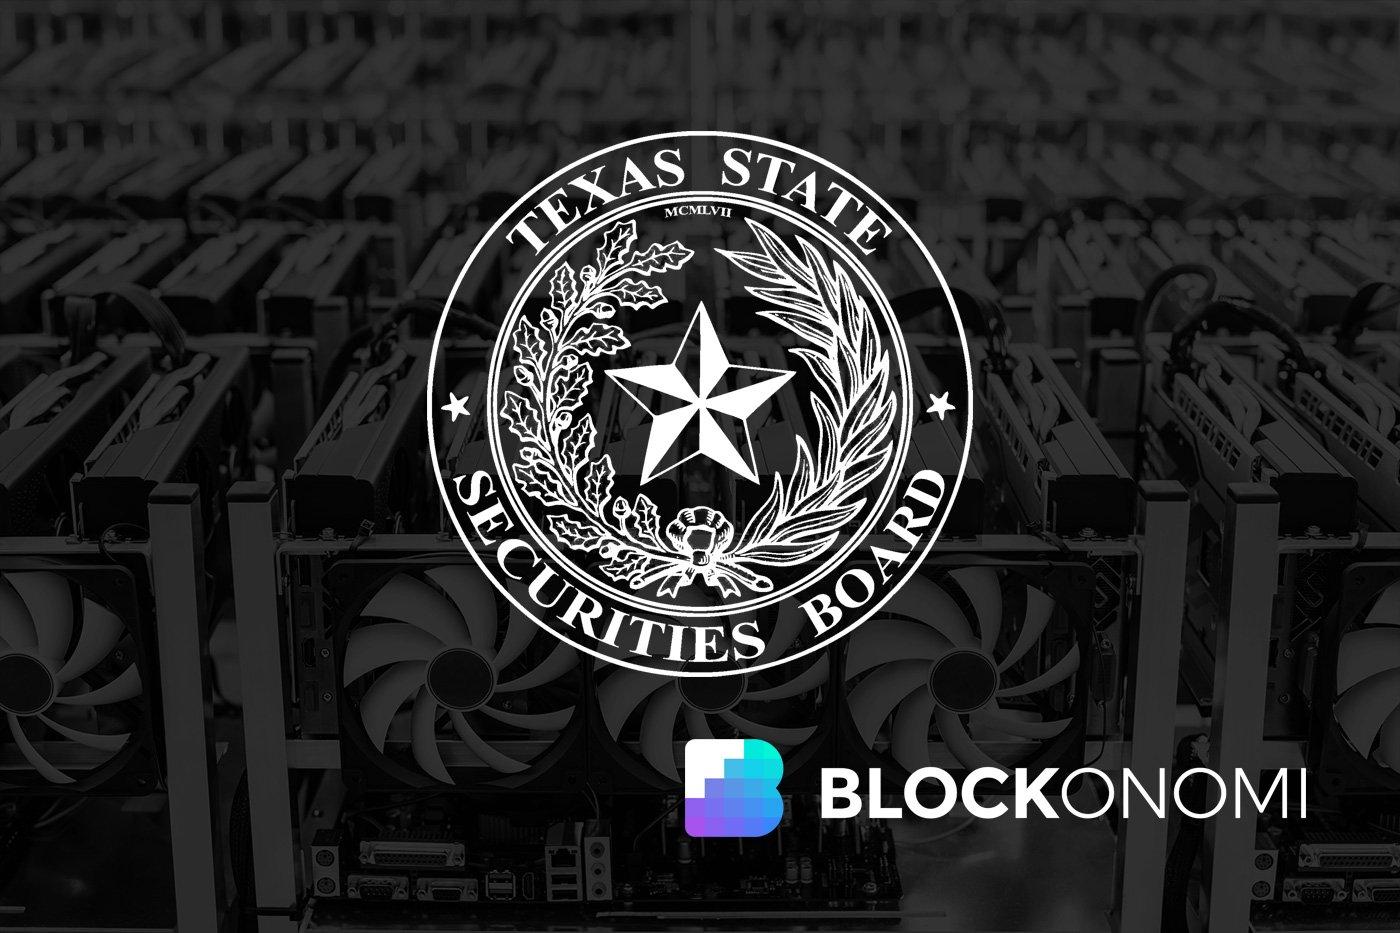 Texas State Cease-Desist